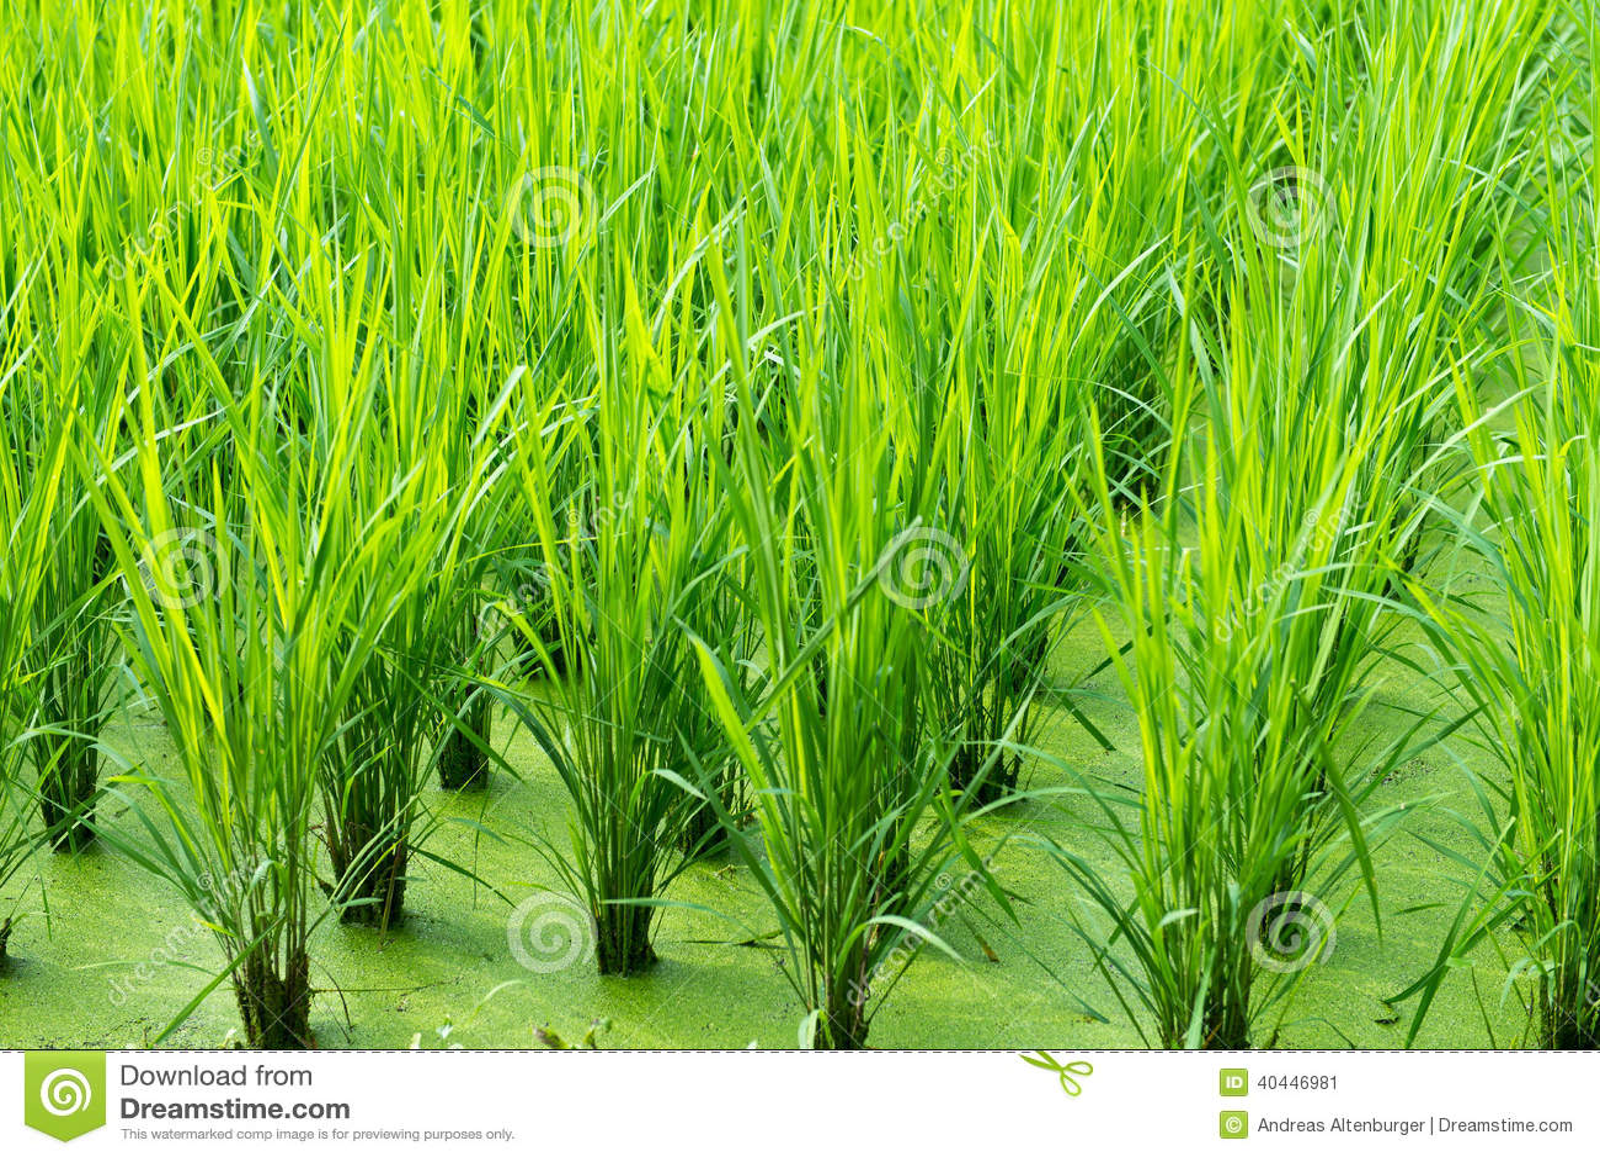 Green rice field background stock image image of growth pattern green rice field background growth pattern toneelgroepblik Gallery